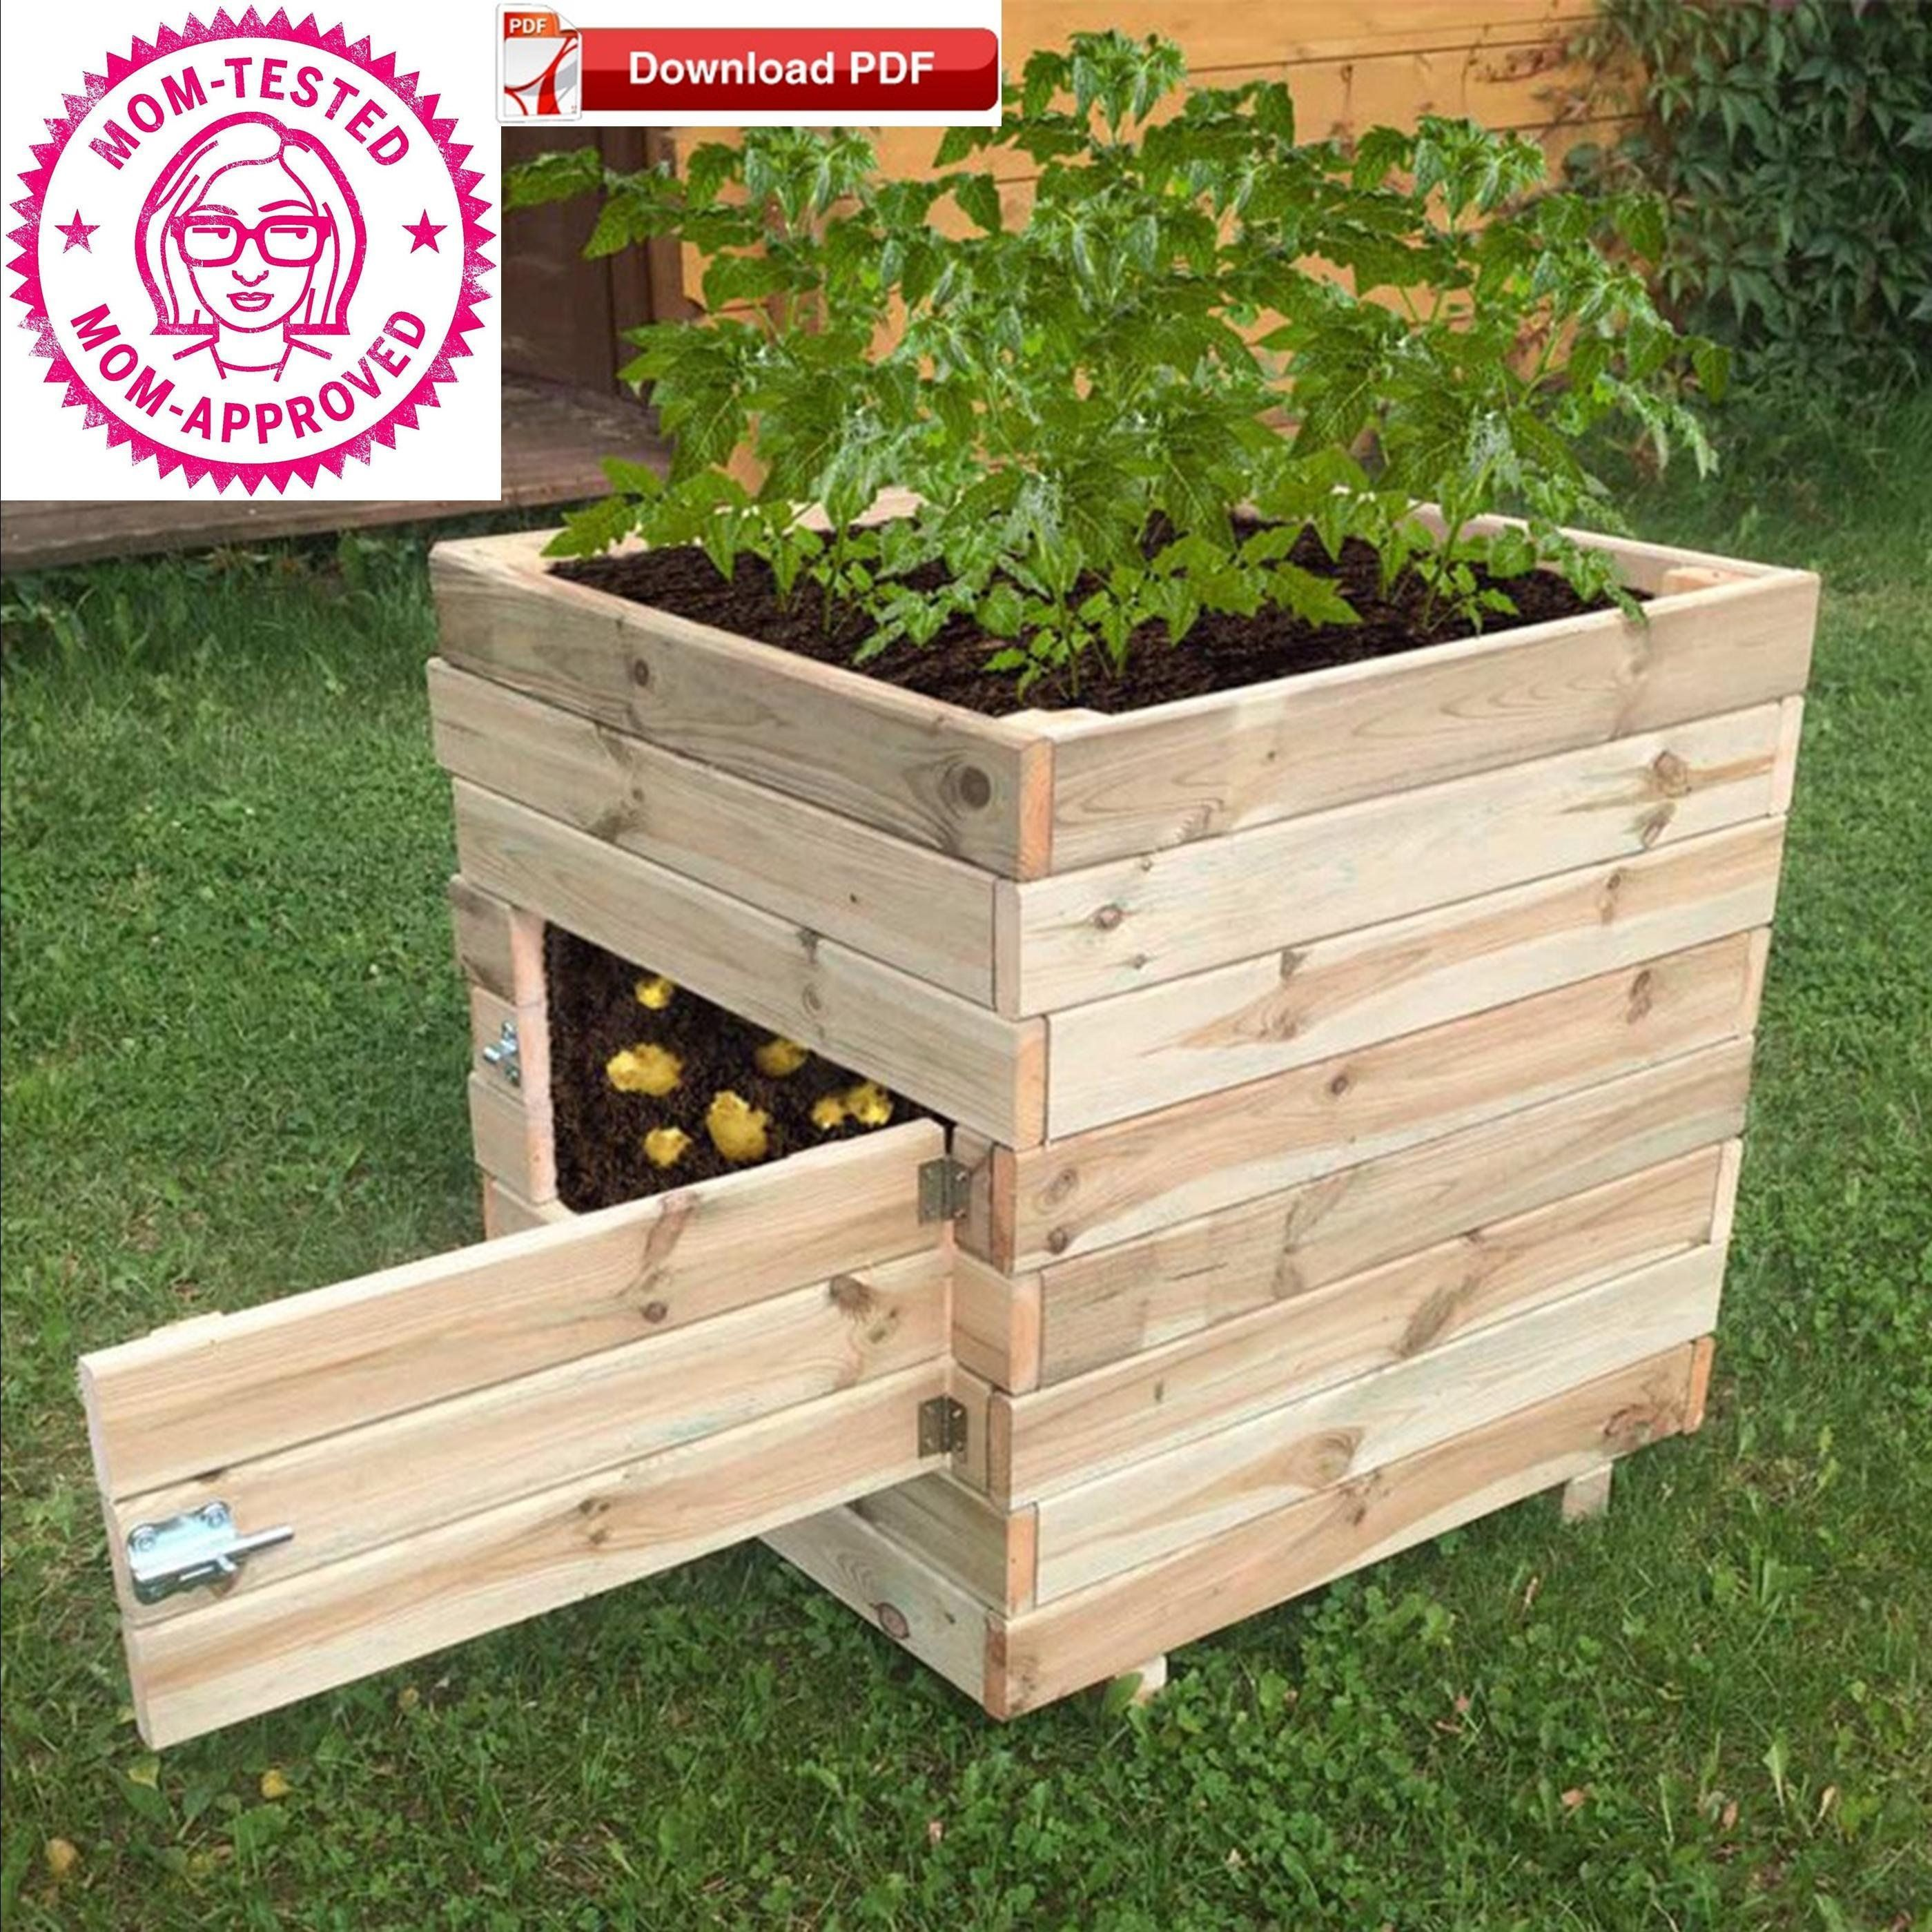 Potato Planter Box Plan Planter Box Plan Pdf Plan Garden Box Etsy Garden Box Plans Planter Box Plans Diy Raised Garden